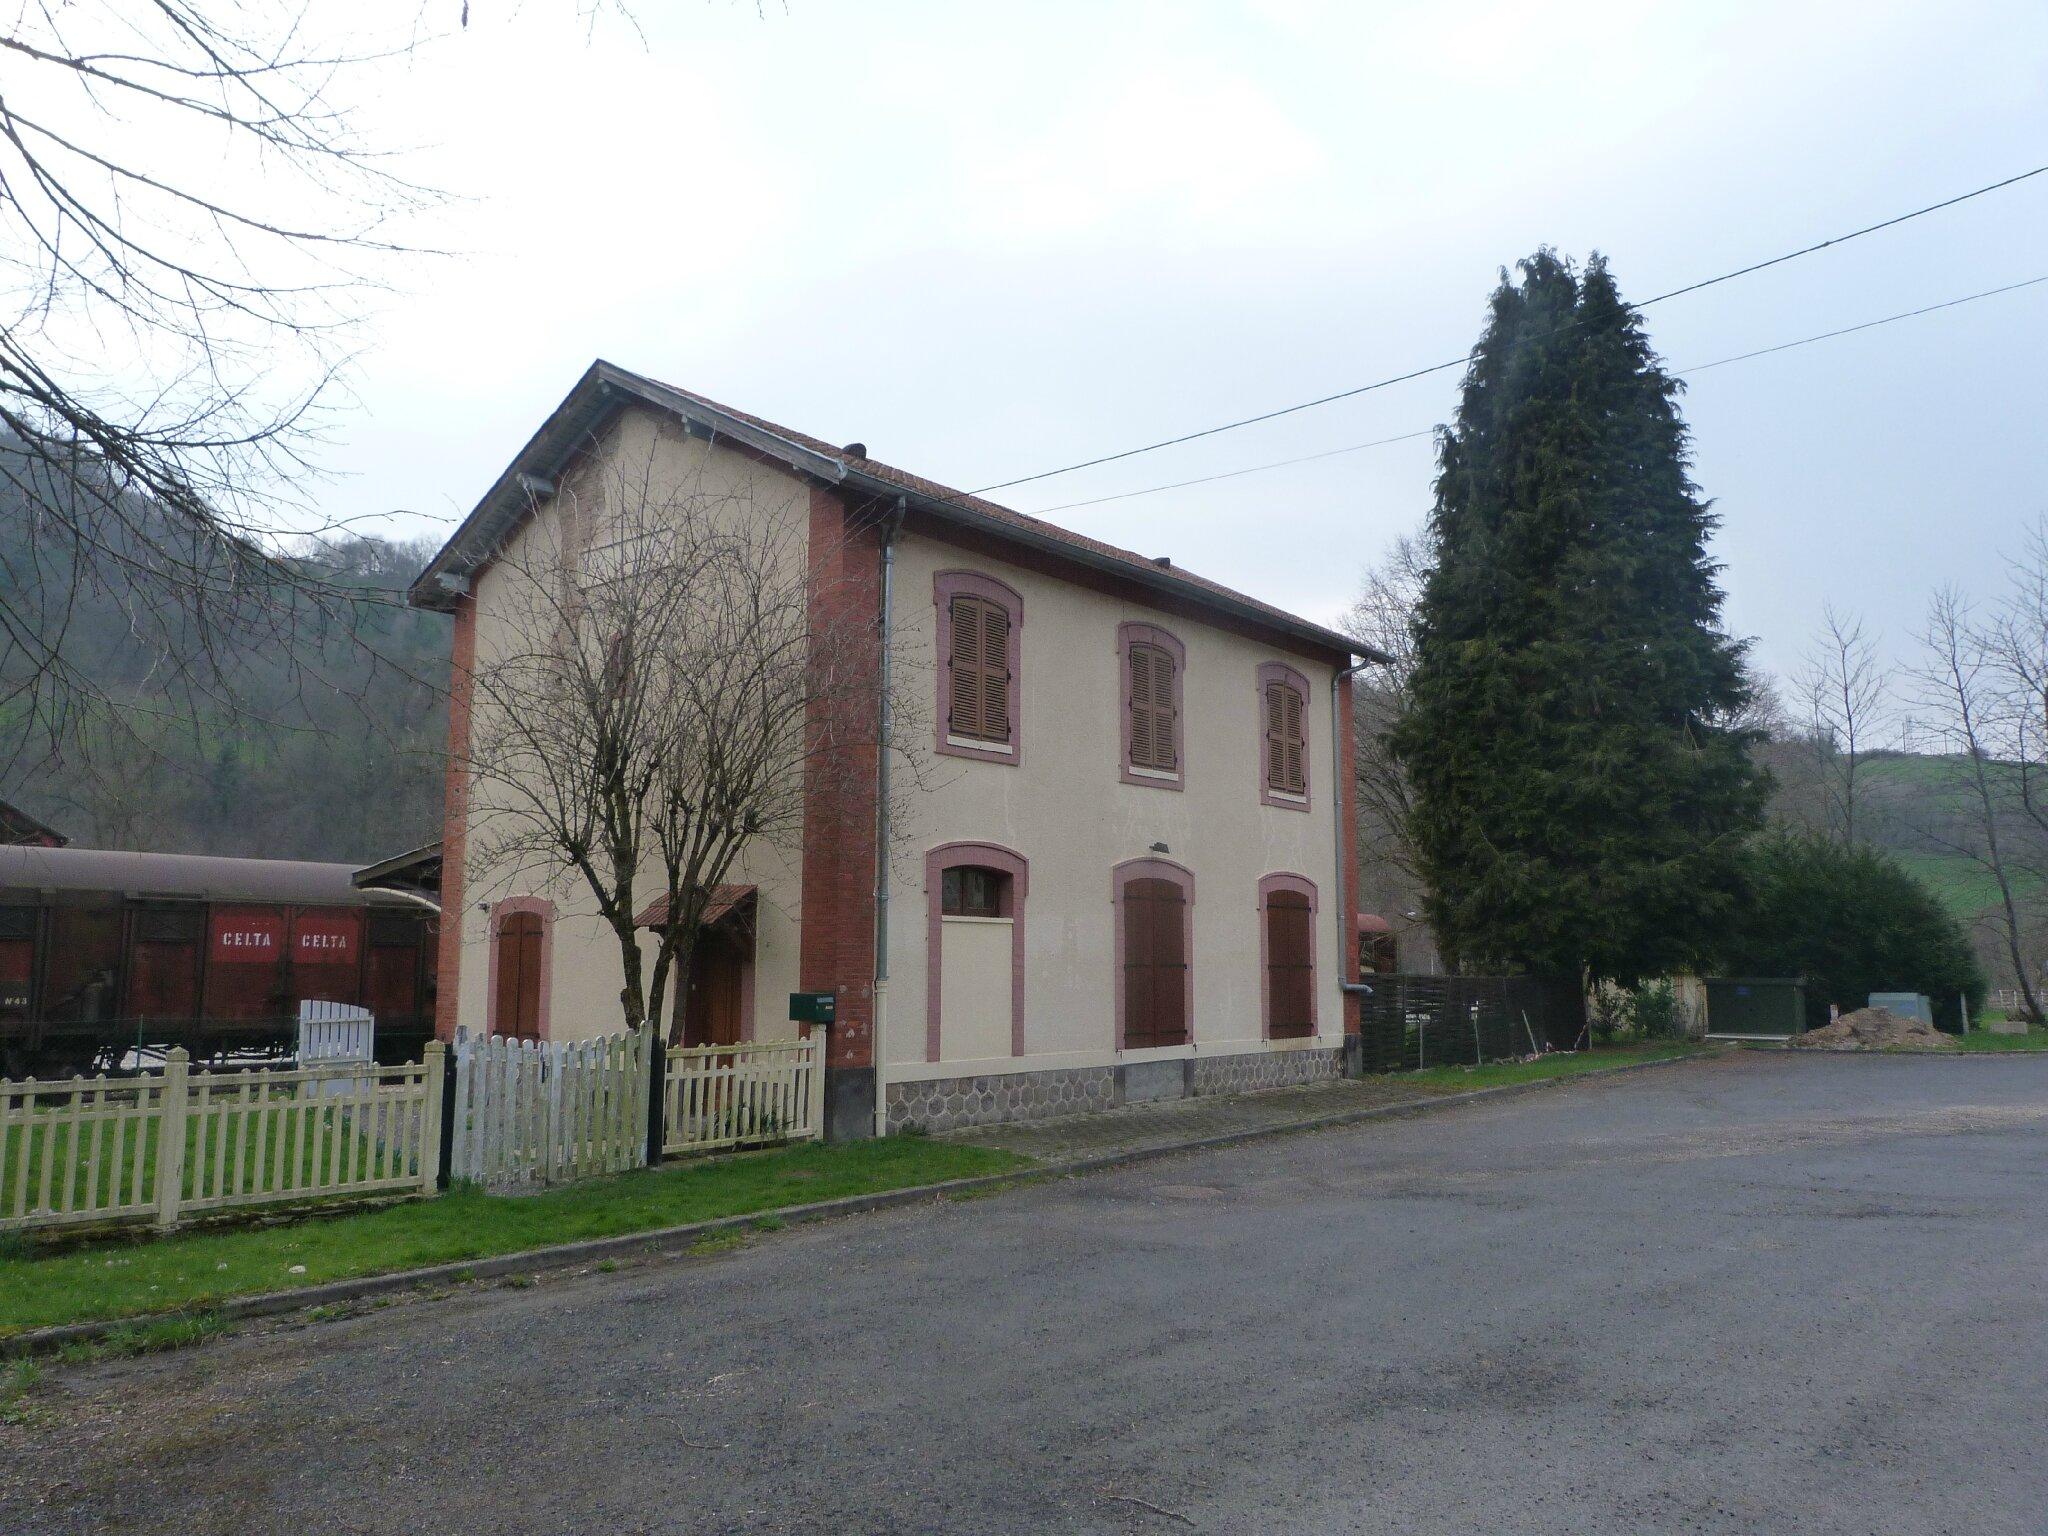 Giroux (Puy de Dôme - 63)